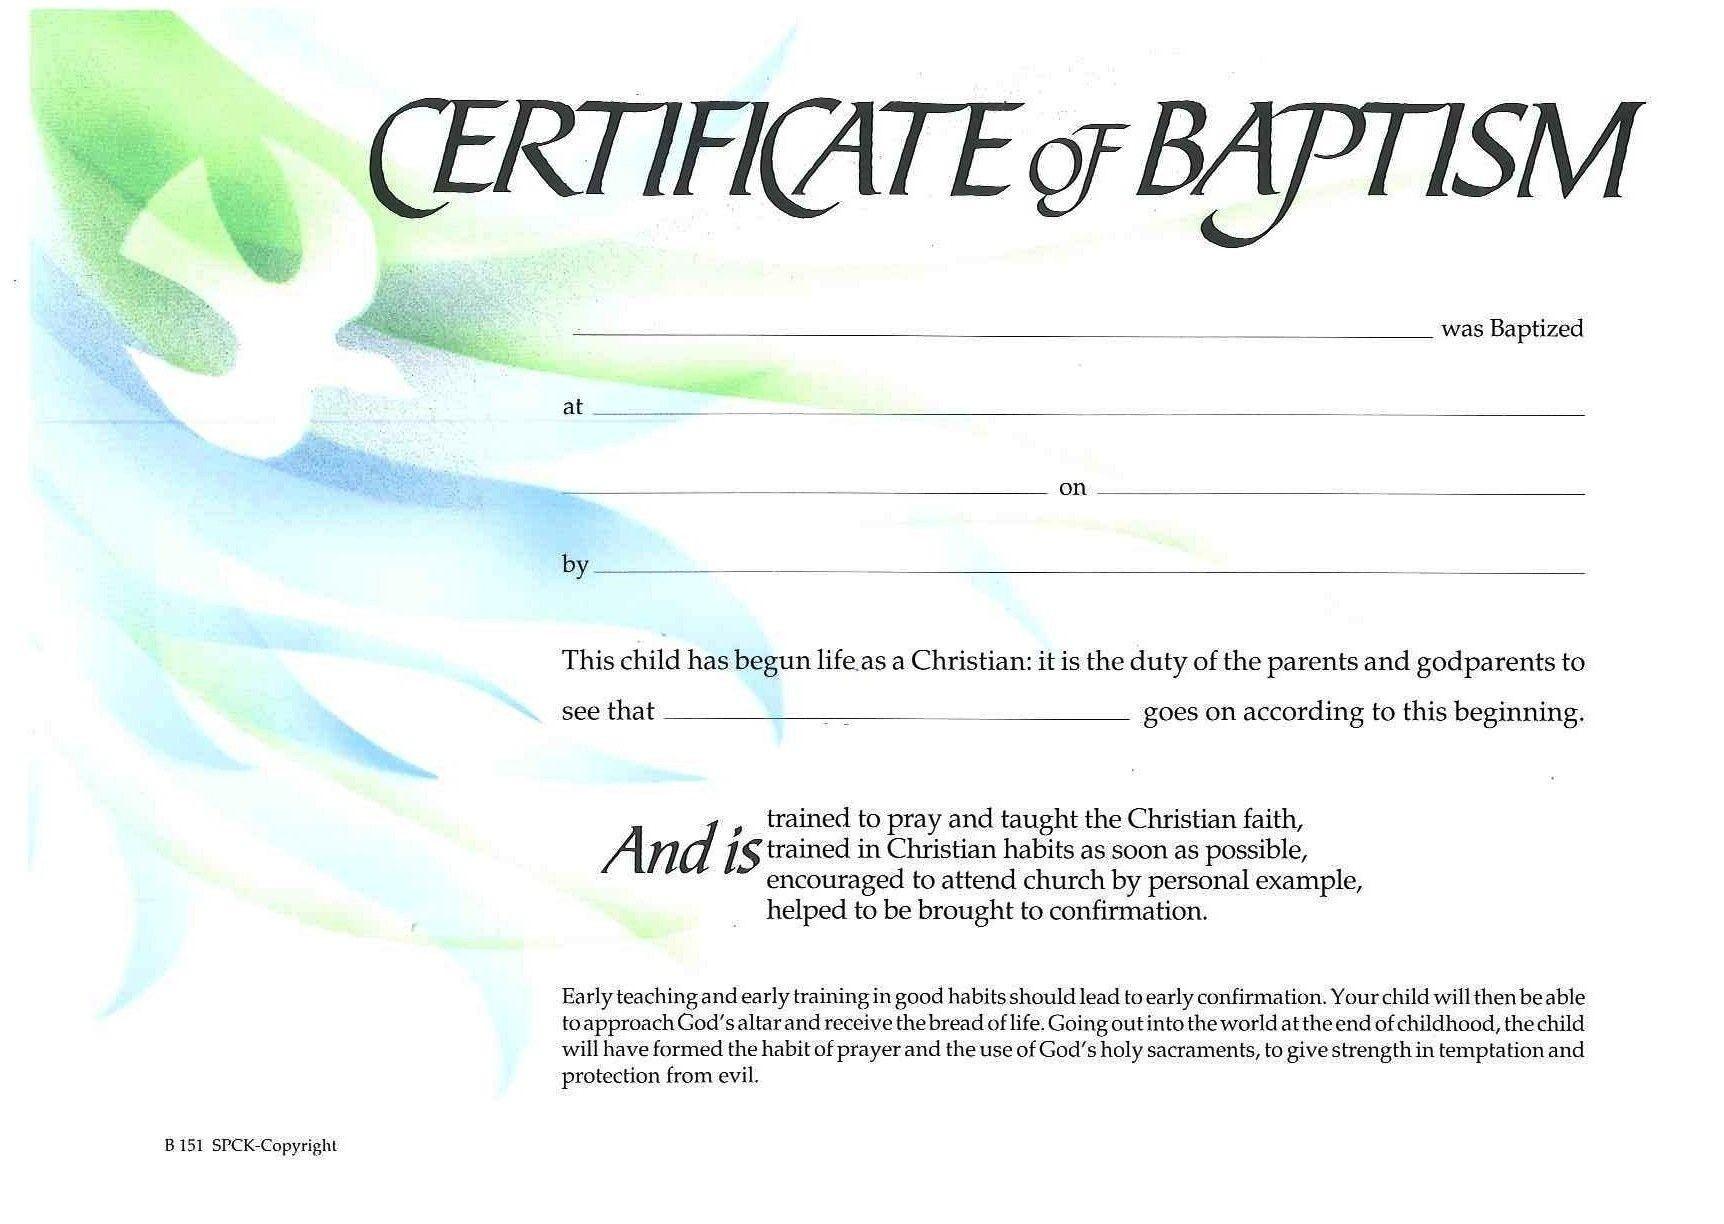 Free Printable Certificate Of Baptism | Certificate Of - Free Printable Baptism Certificate